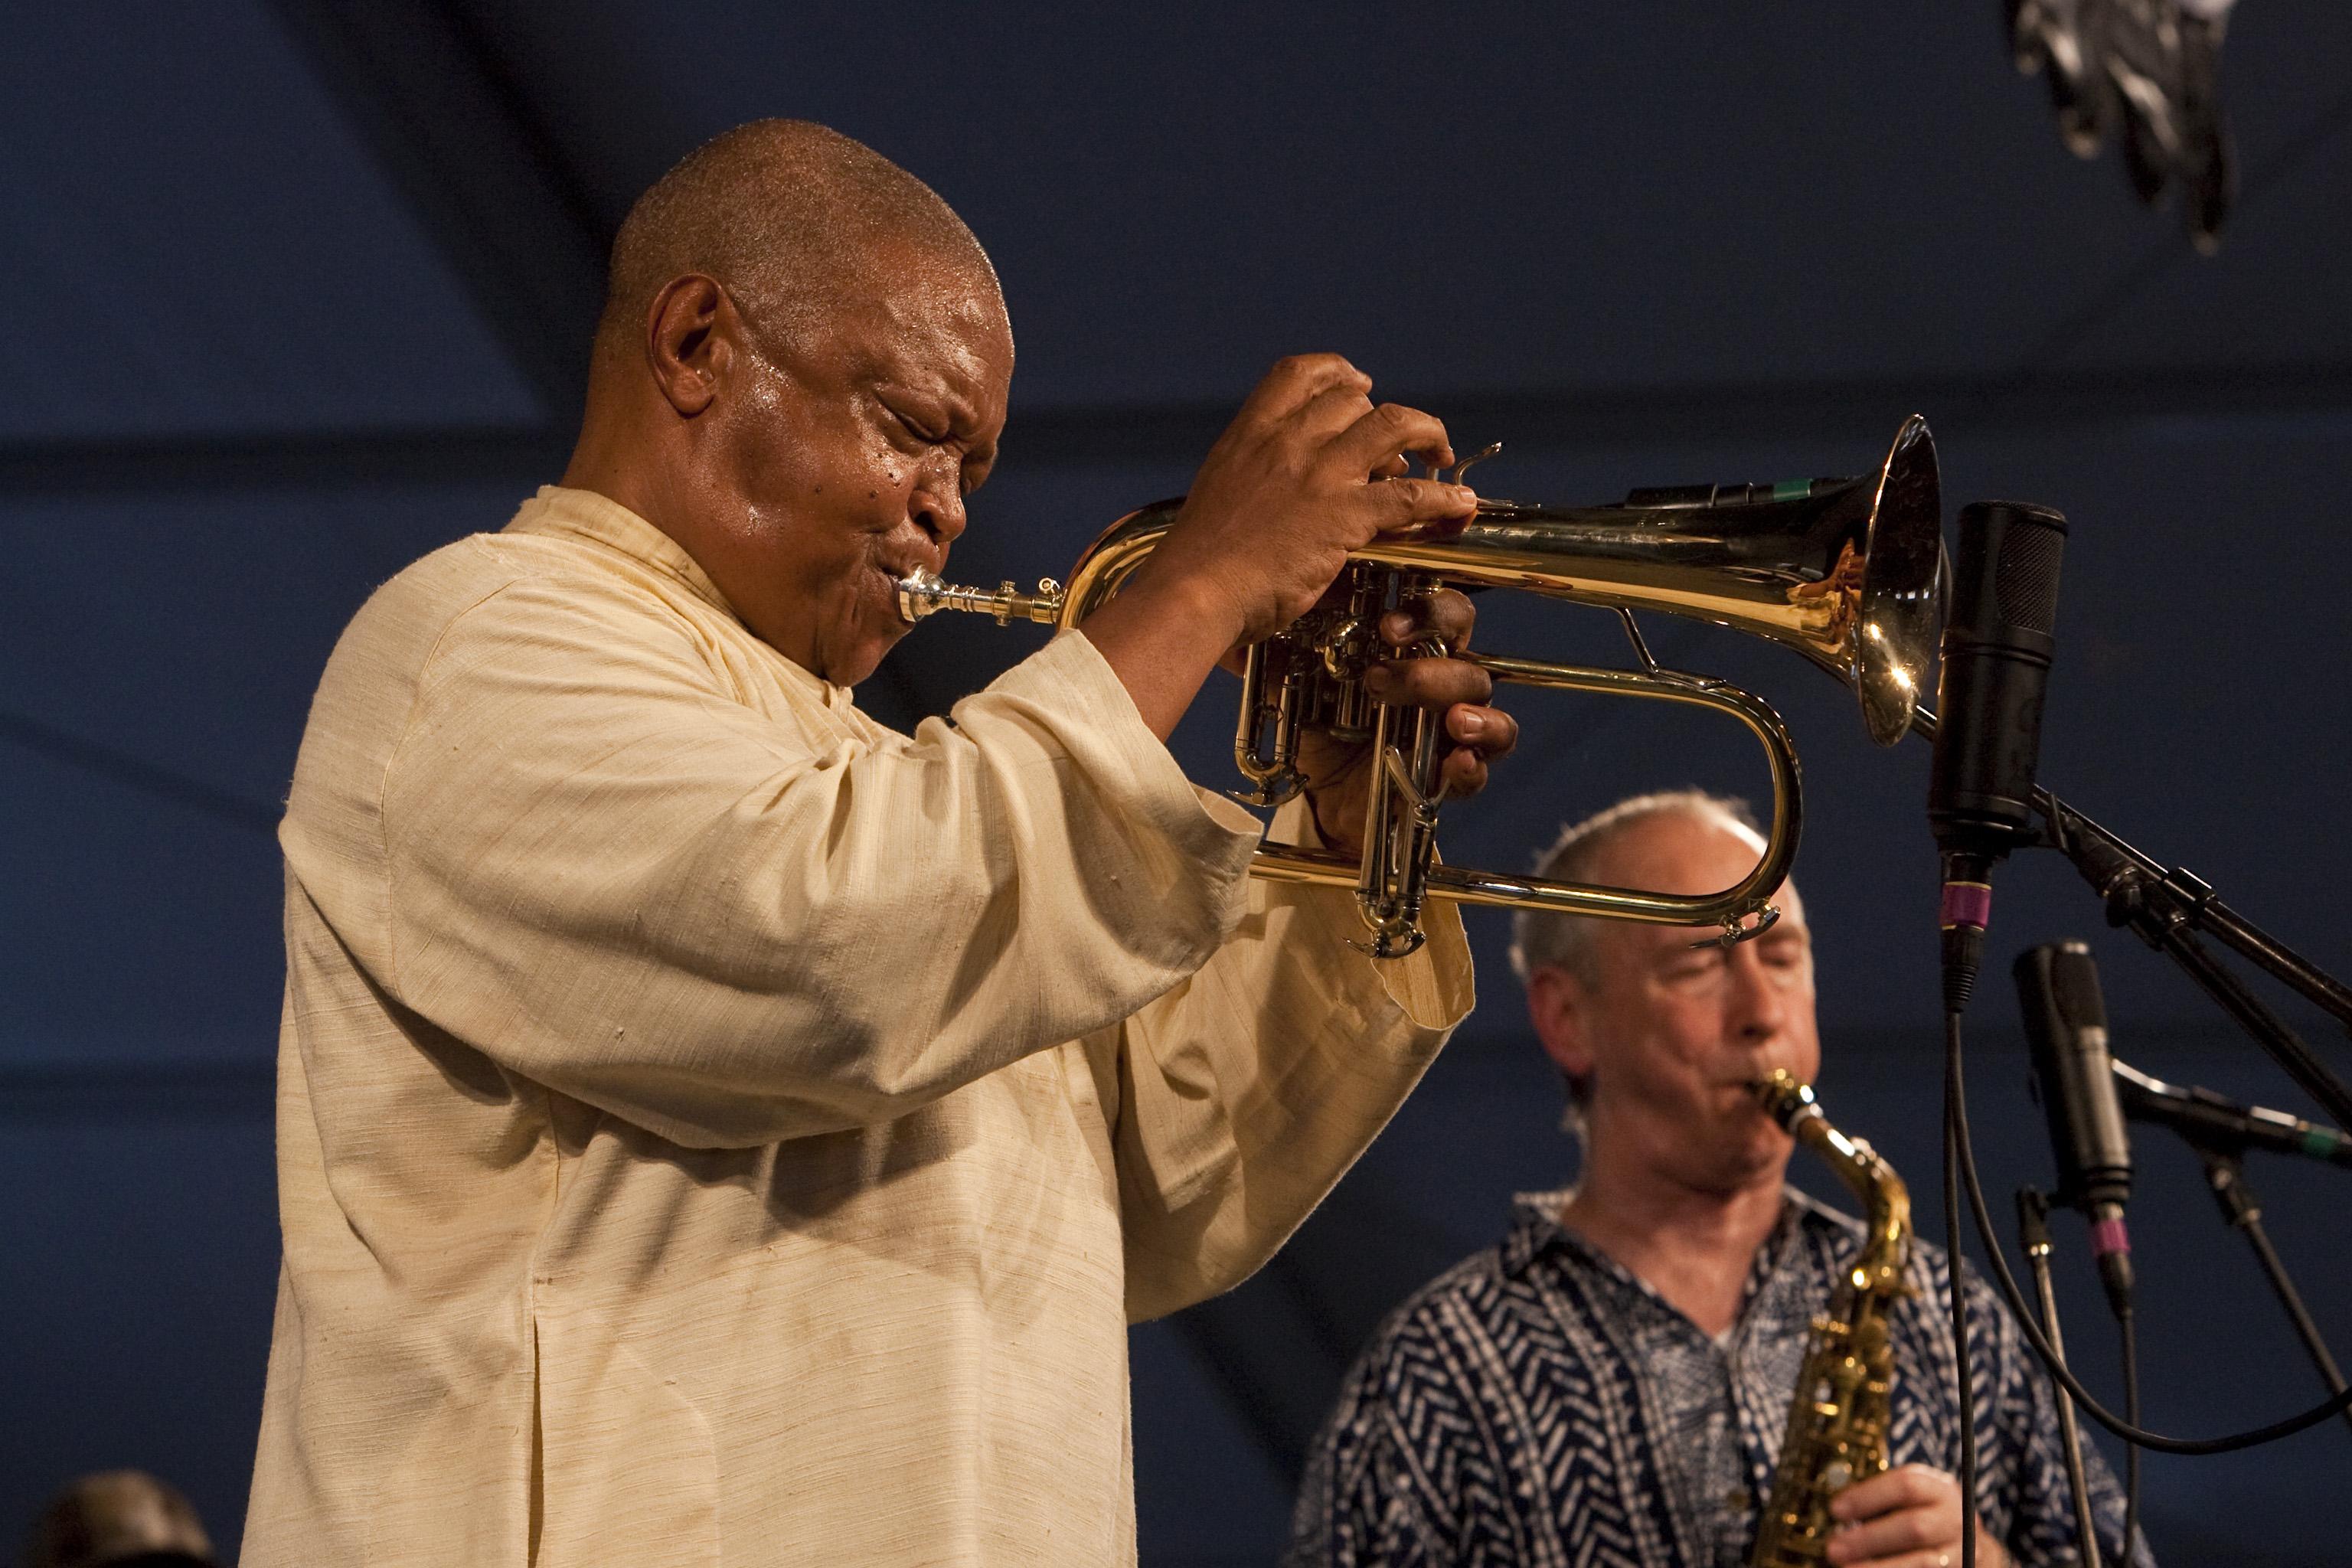 Hugh Masekela at the 40th Anniversary New Orleans Jazz & Heritage Festival, USA